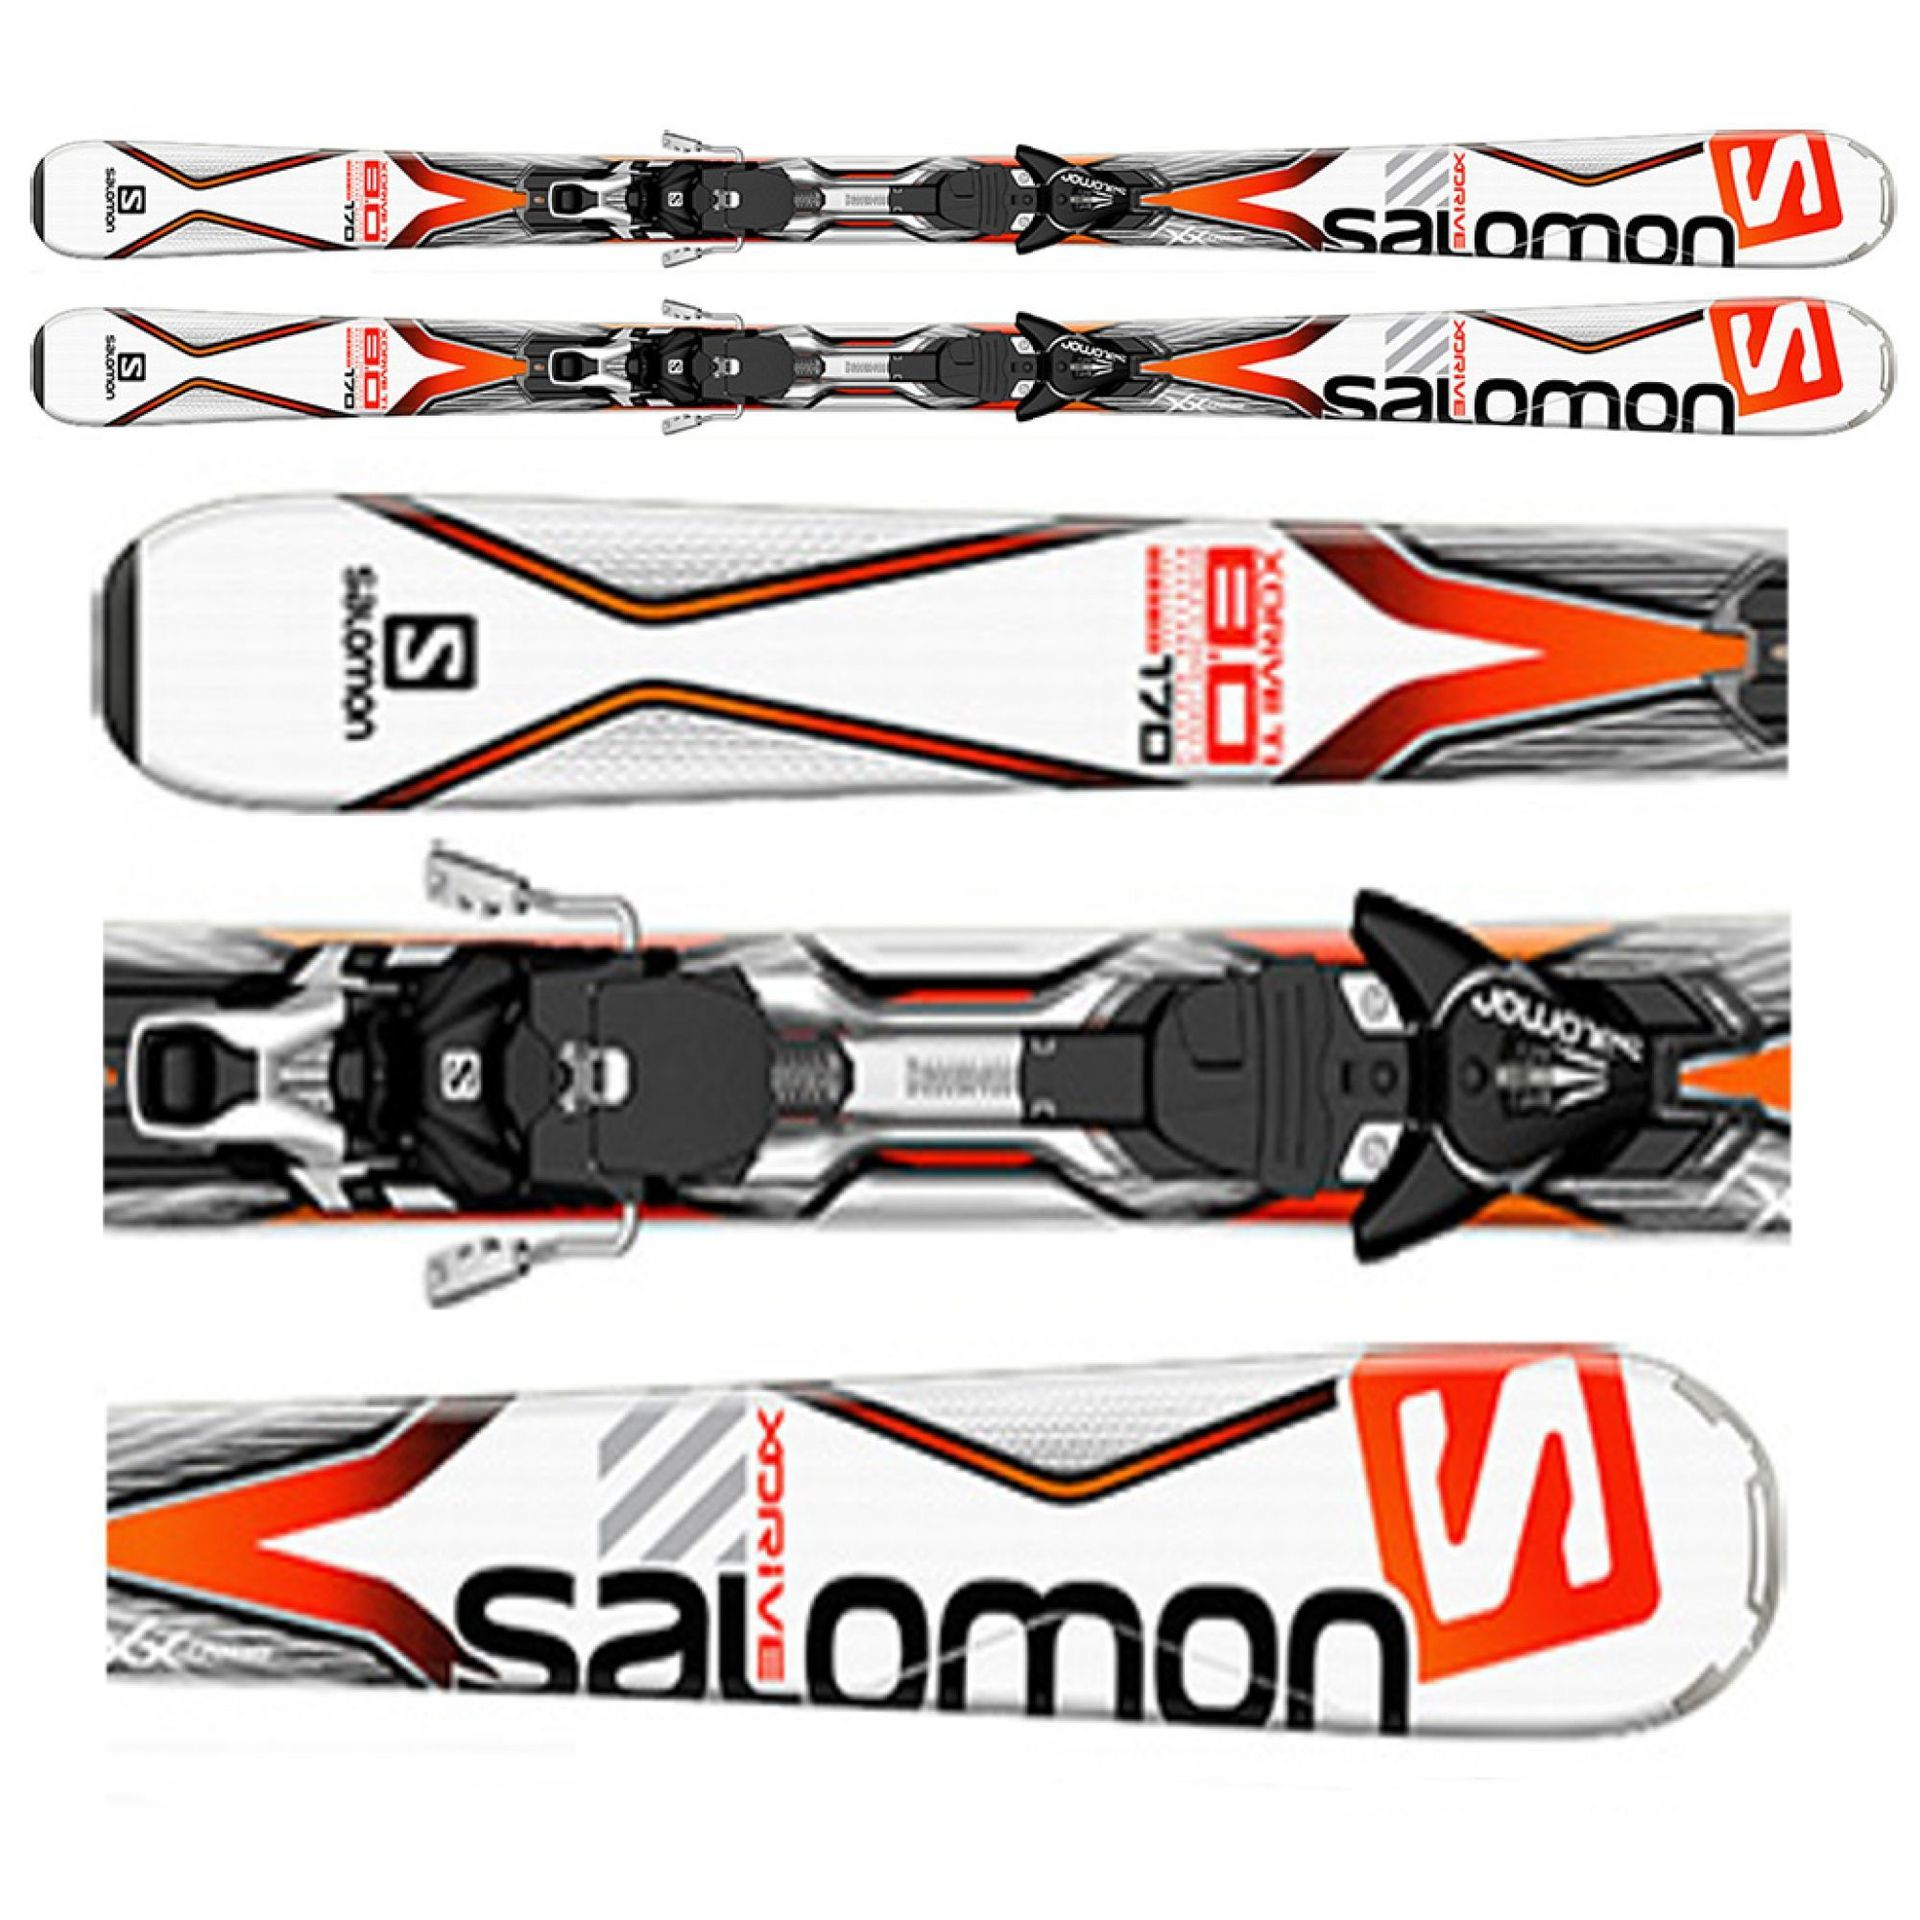 NARTY SALOMON X-DRIVE 8.0 TI 2